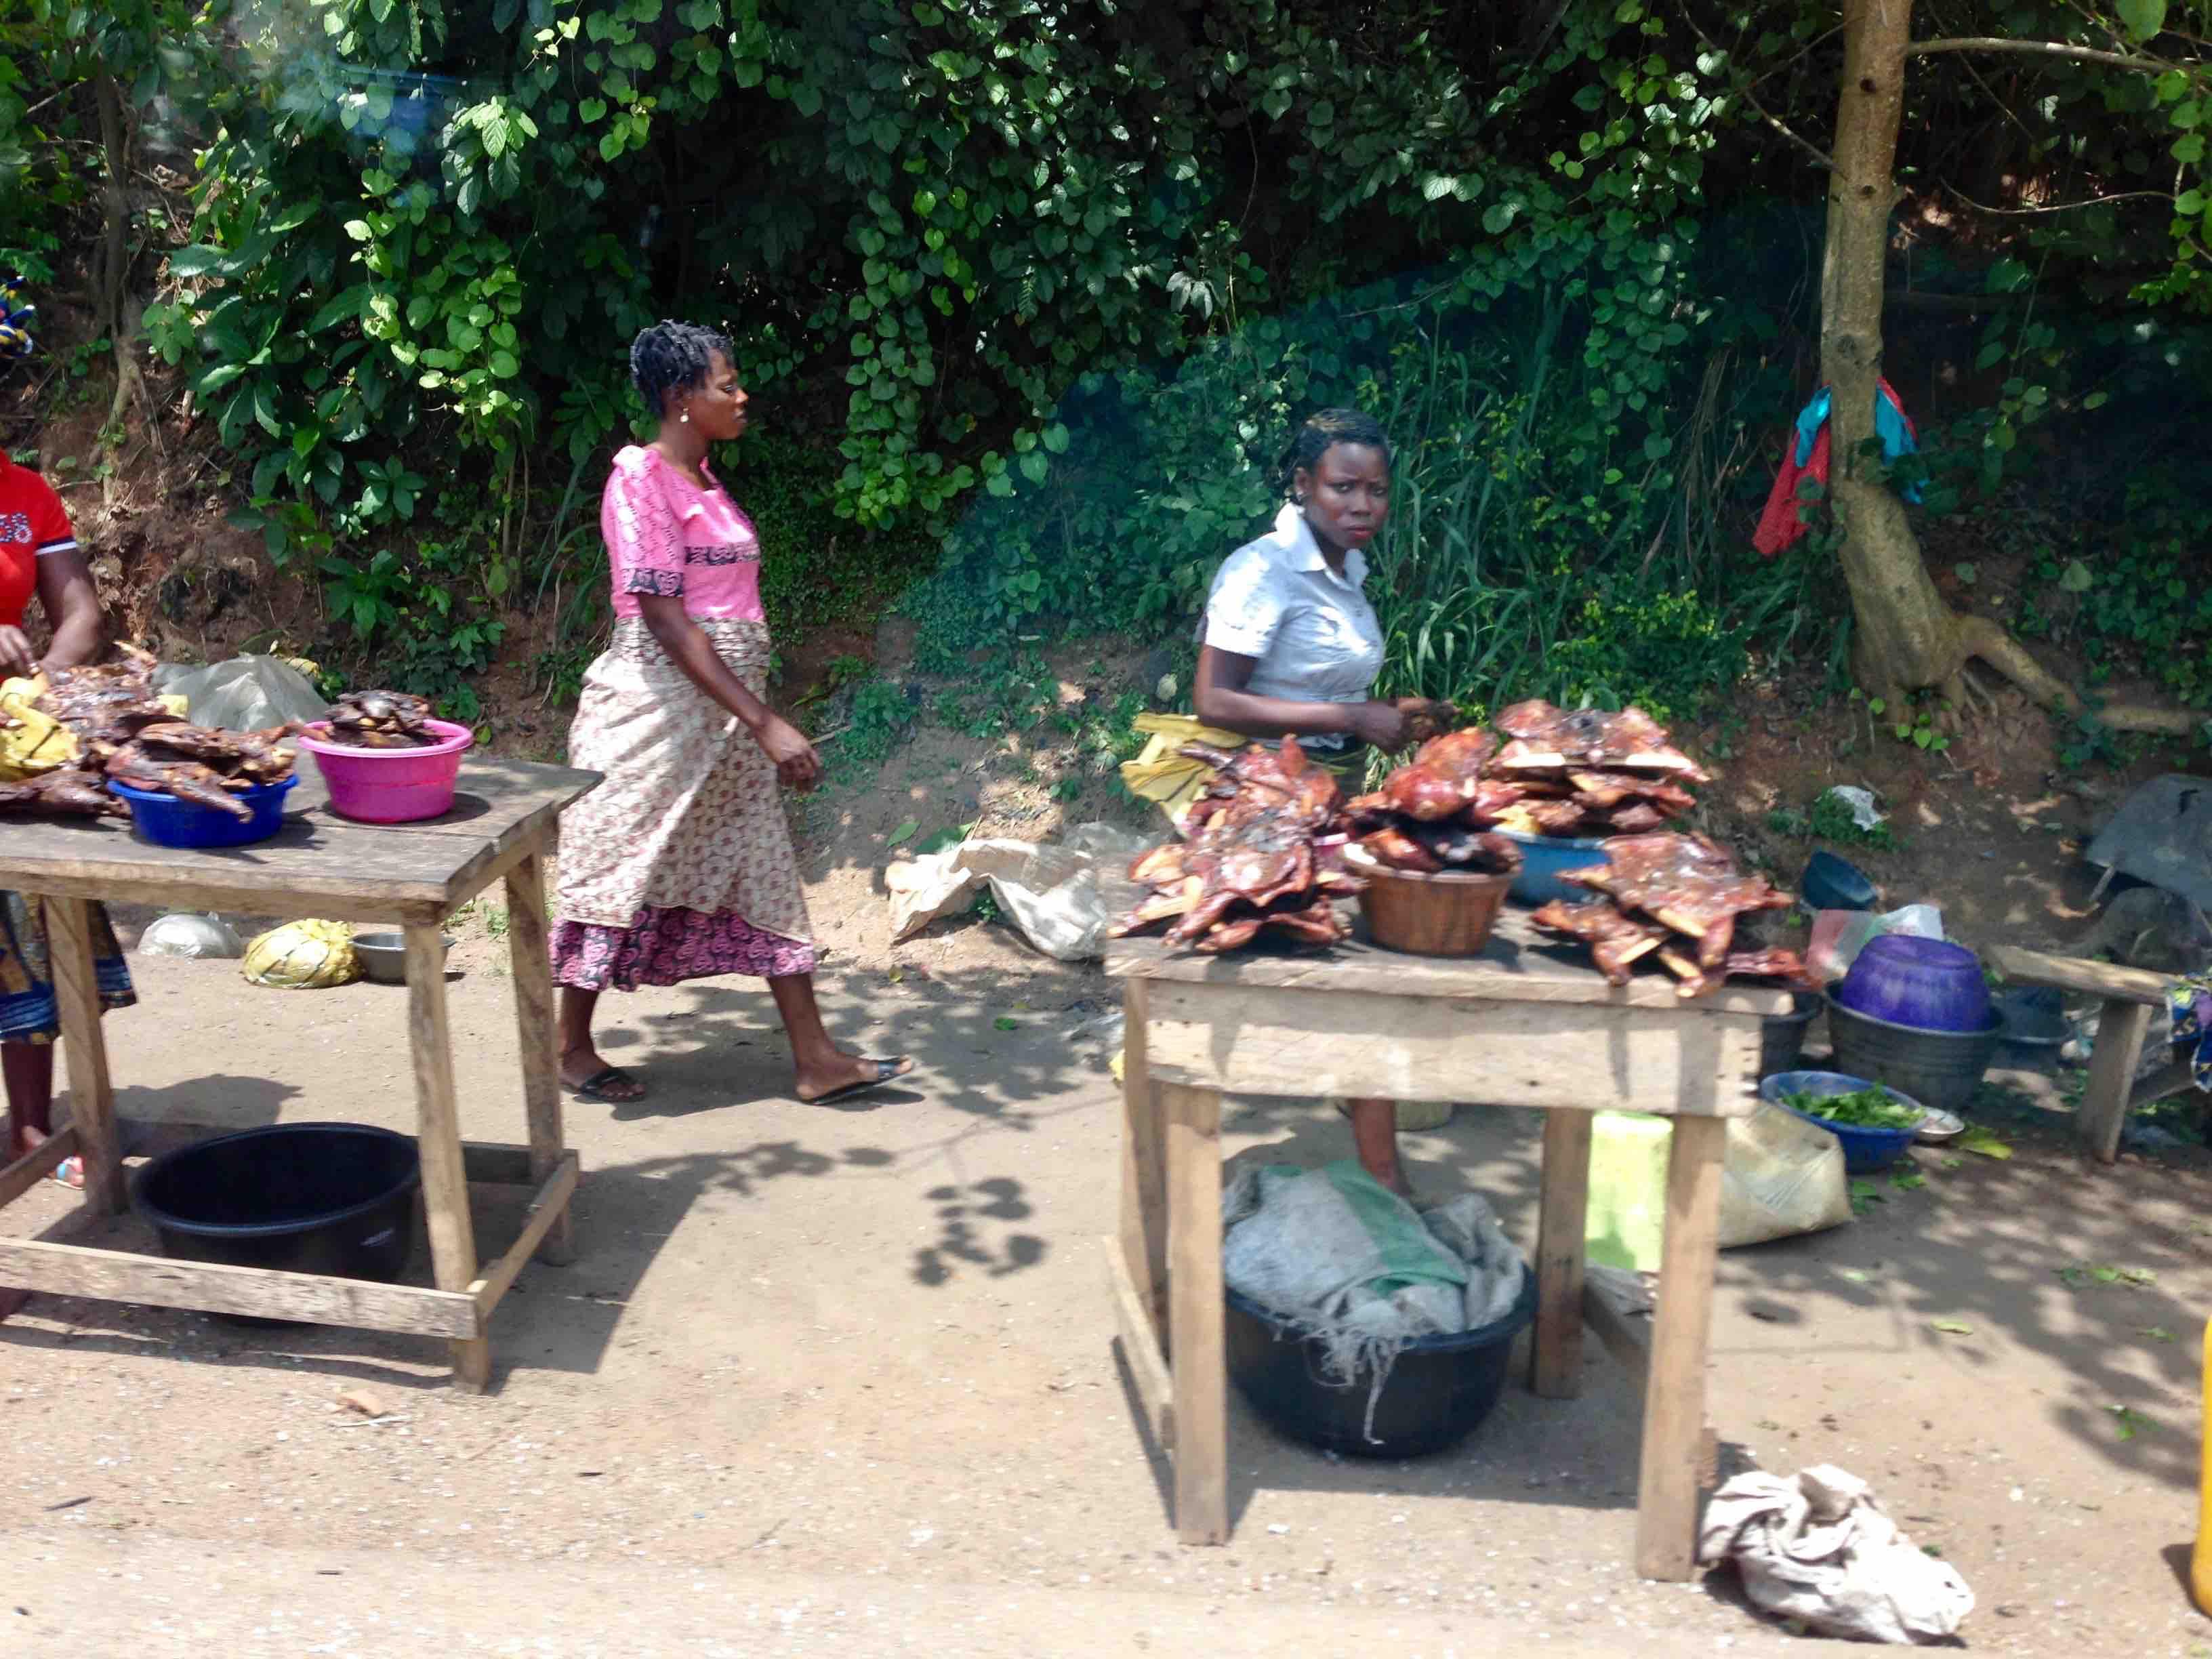 Women smoking bushmeat, Bushmeat Roadside Market, Ibadan - Ife Expressway, Osun, Nigeria. #JujuFilms